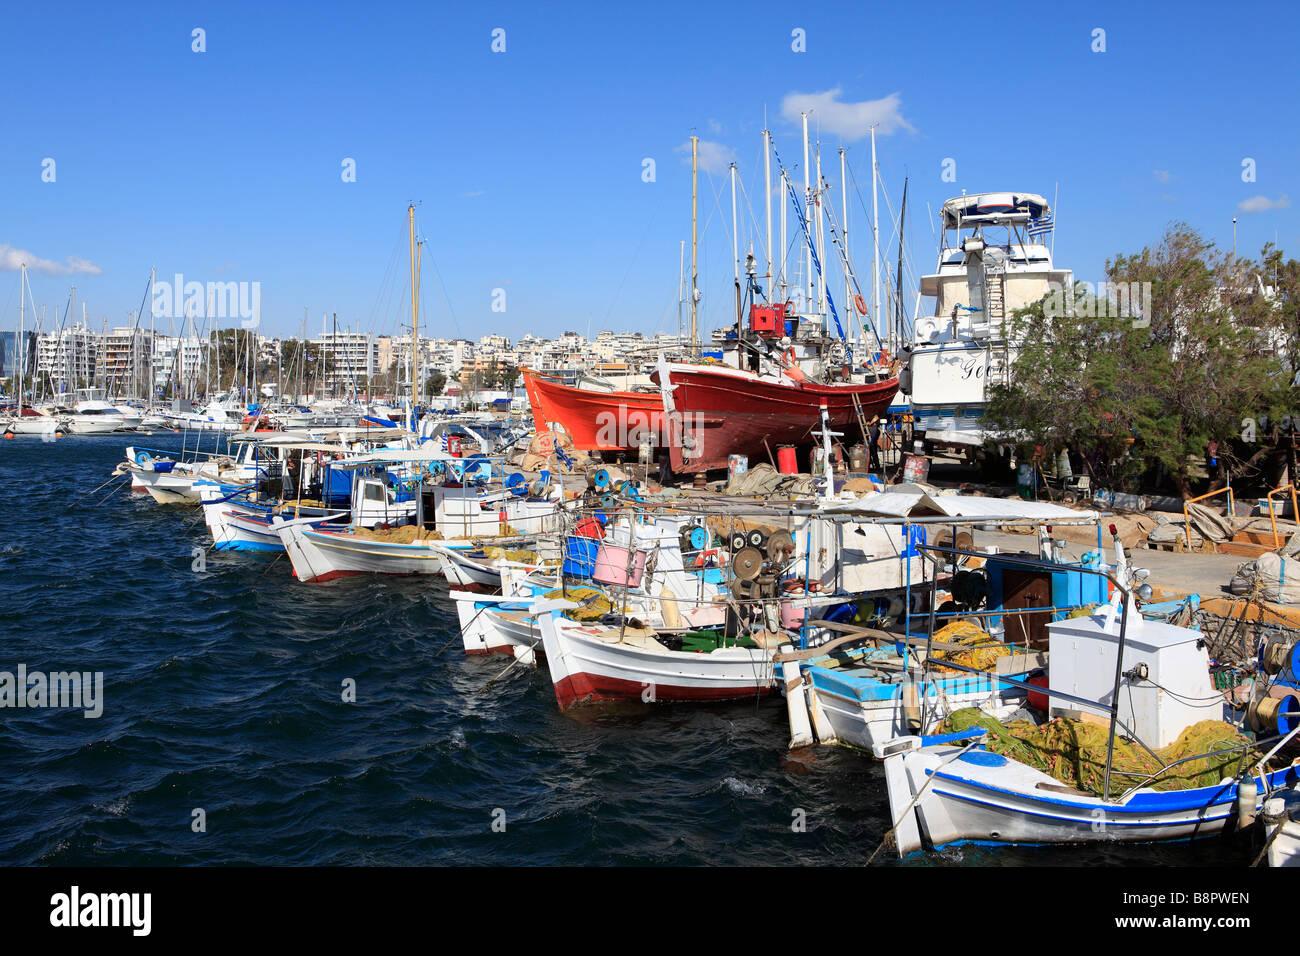 Know your Geography 2 - Page 3 Greece-attiki-athens-kalamaki-alimos-yacht-marina-B8PWEN